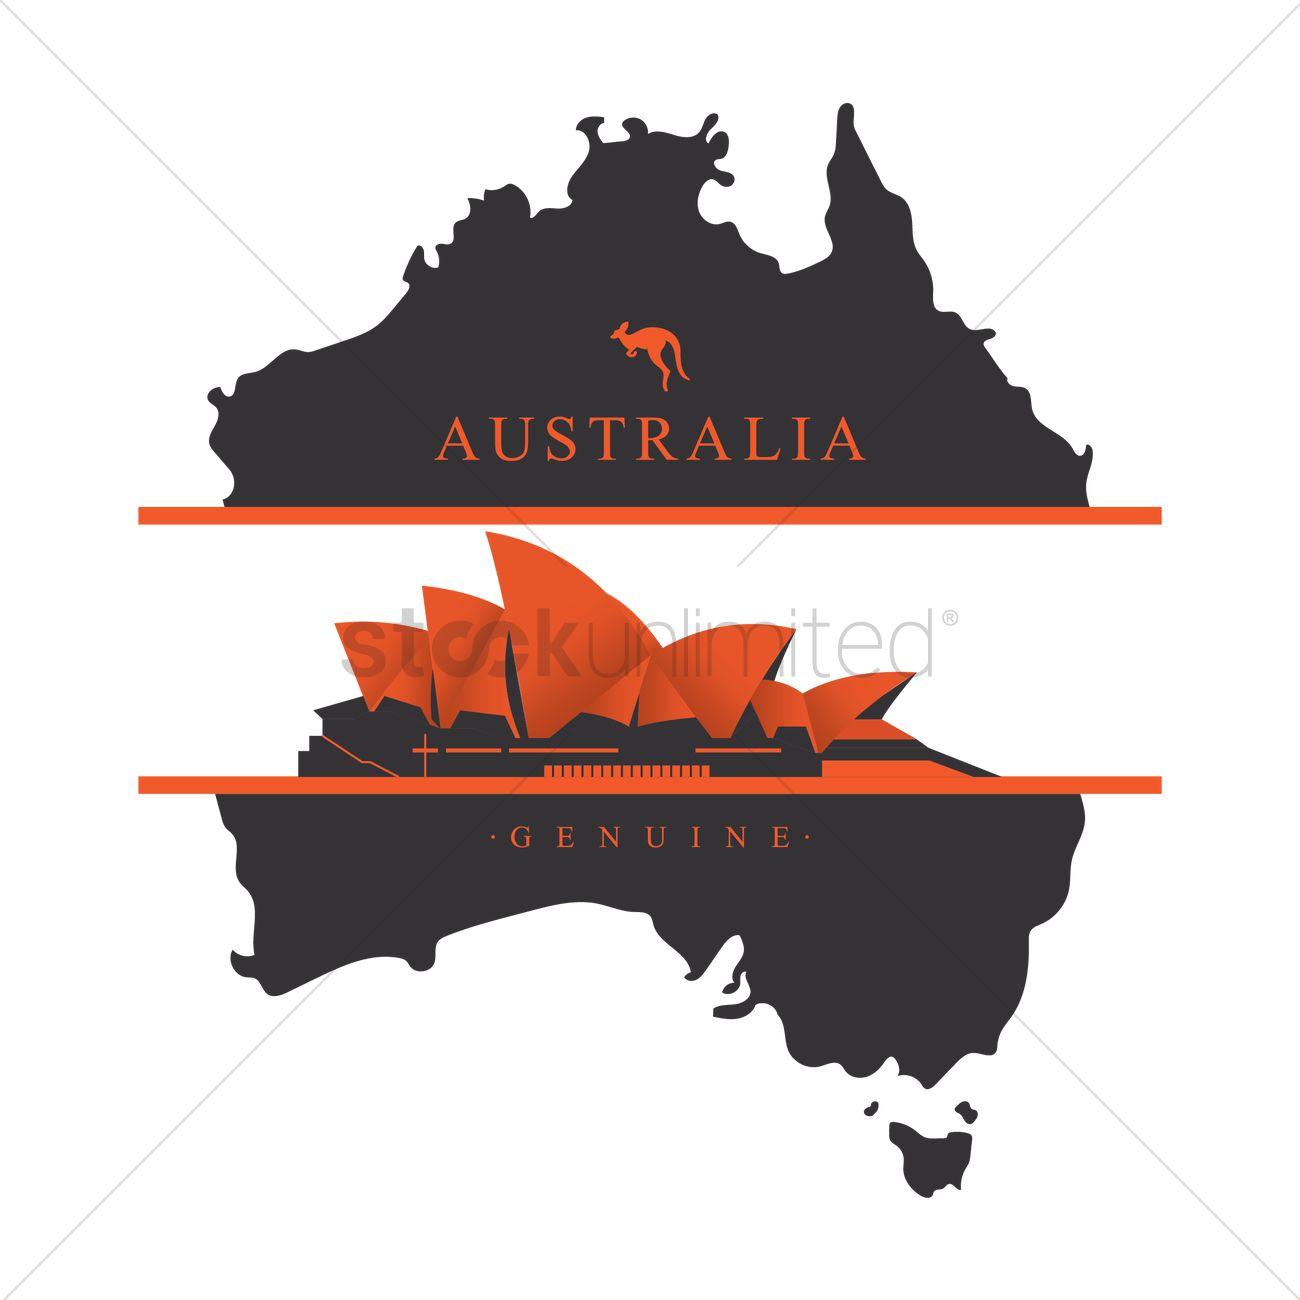 Sydney opera house on australia map label Vector Image